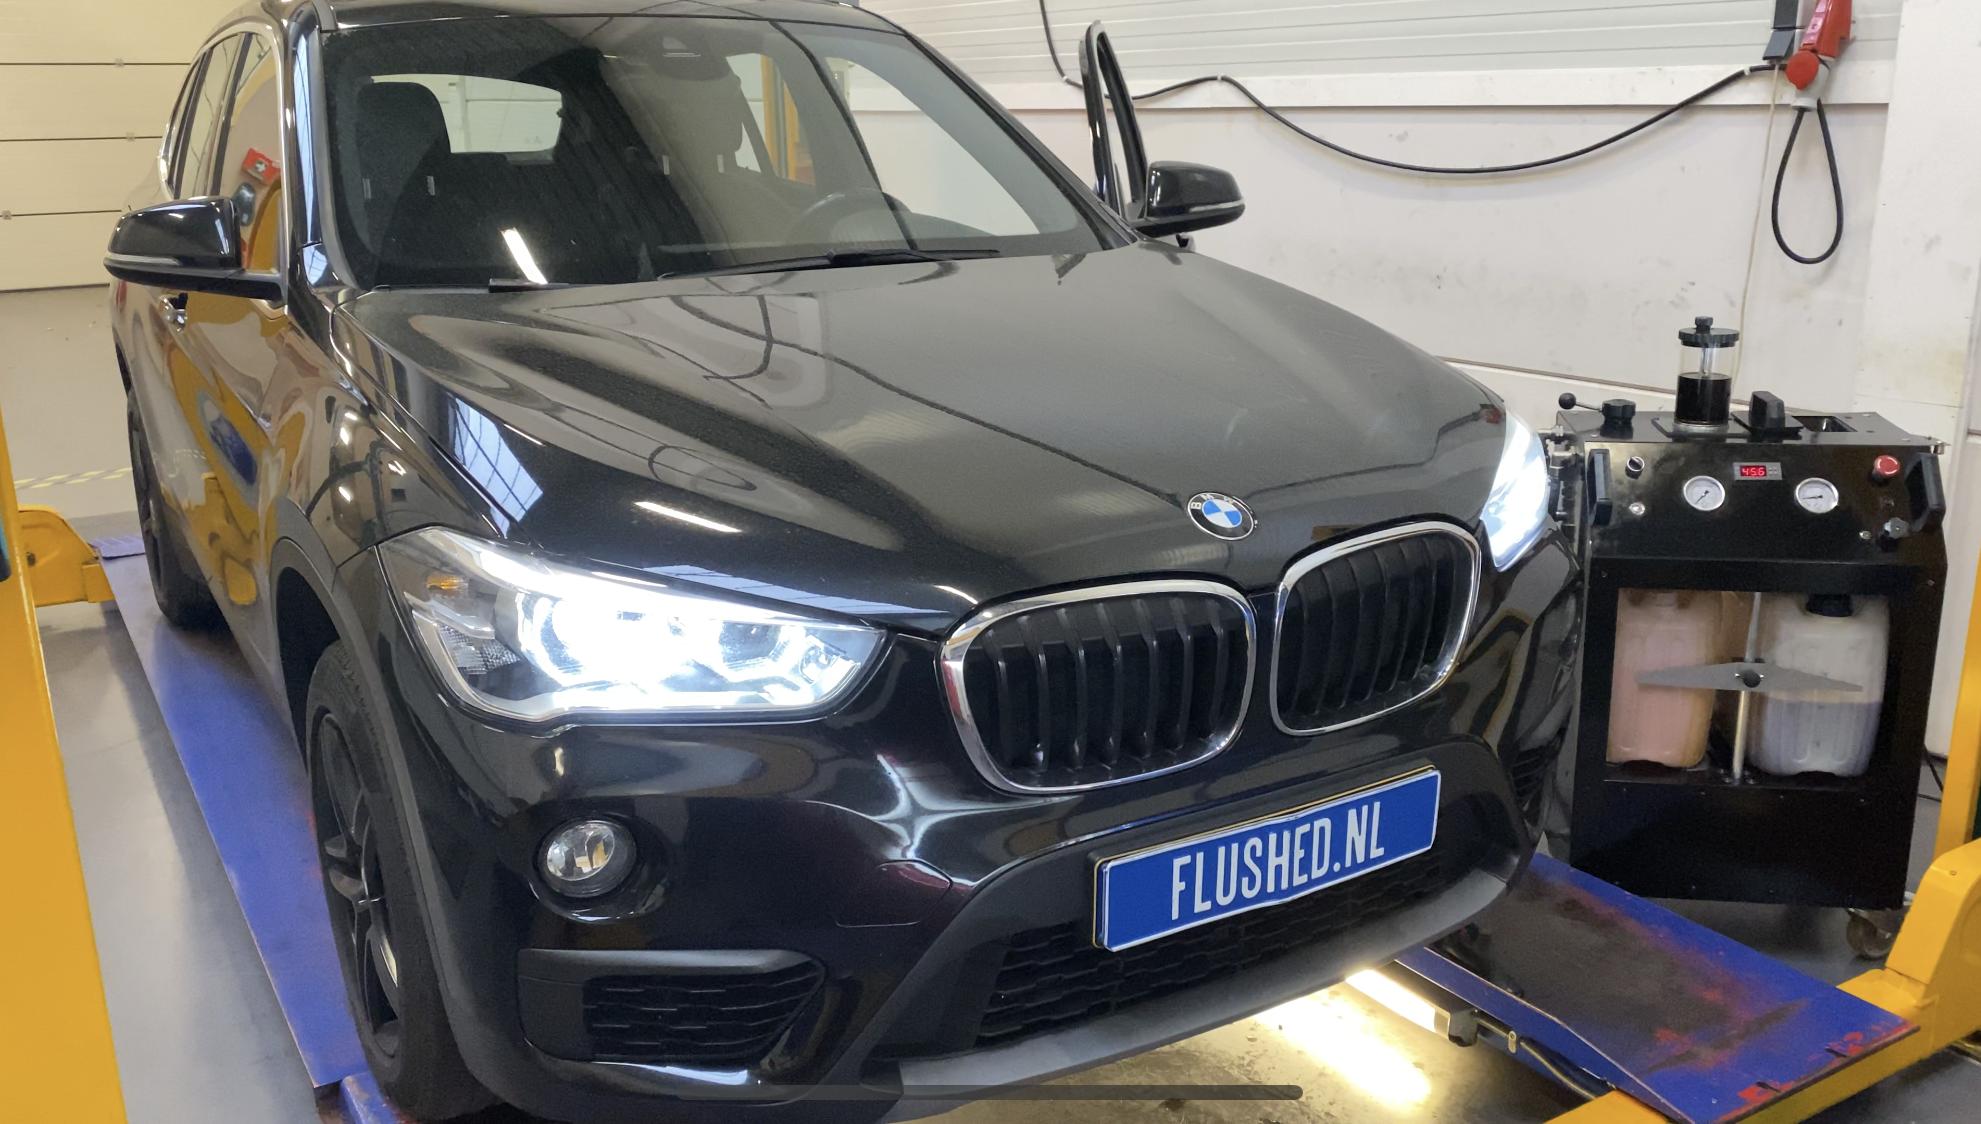 BMW X1 Automaatbak Spoelen